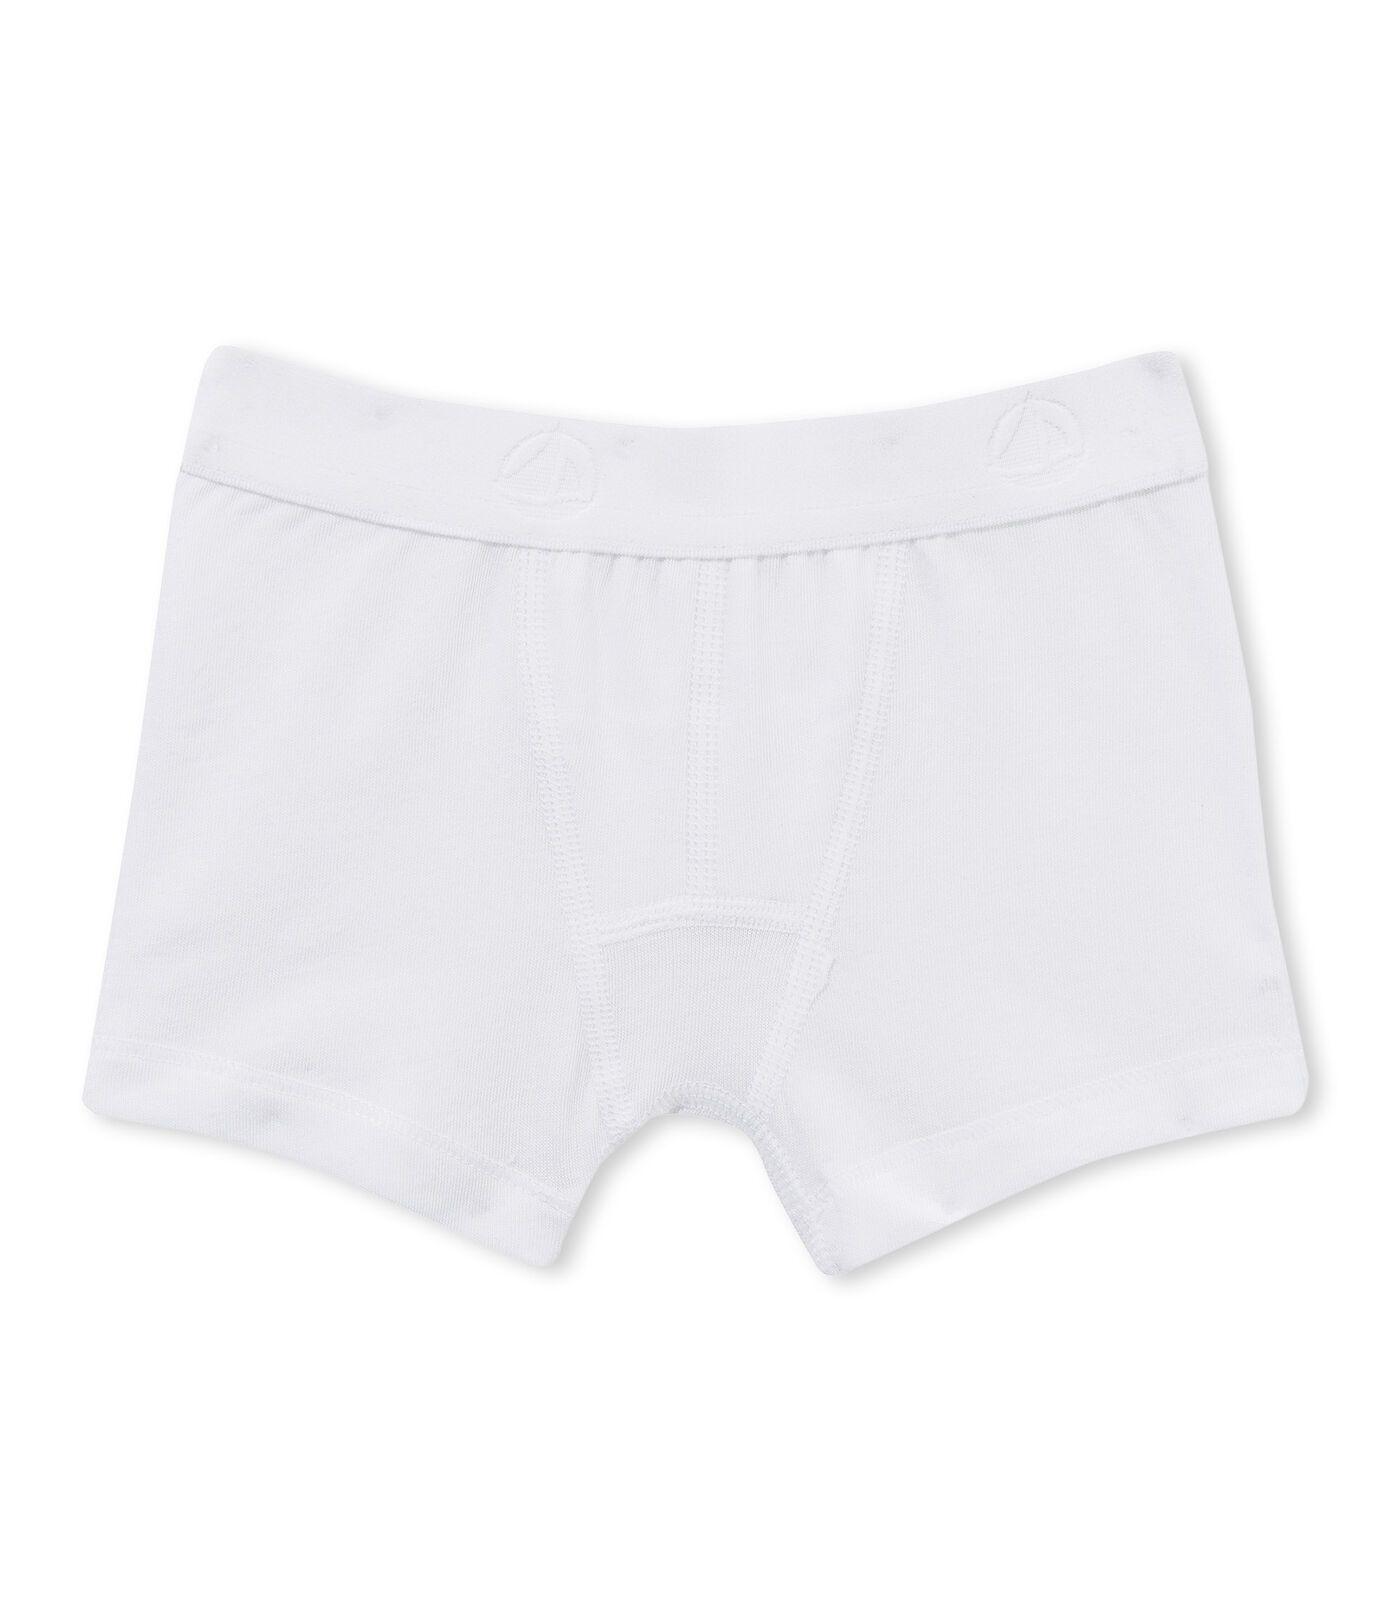 15048 / WHITE / Boy's Boxers